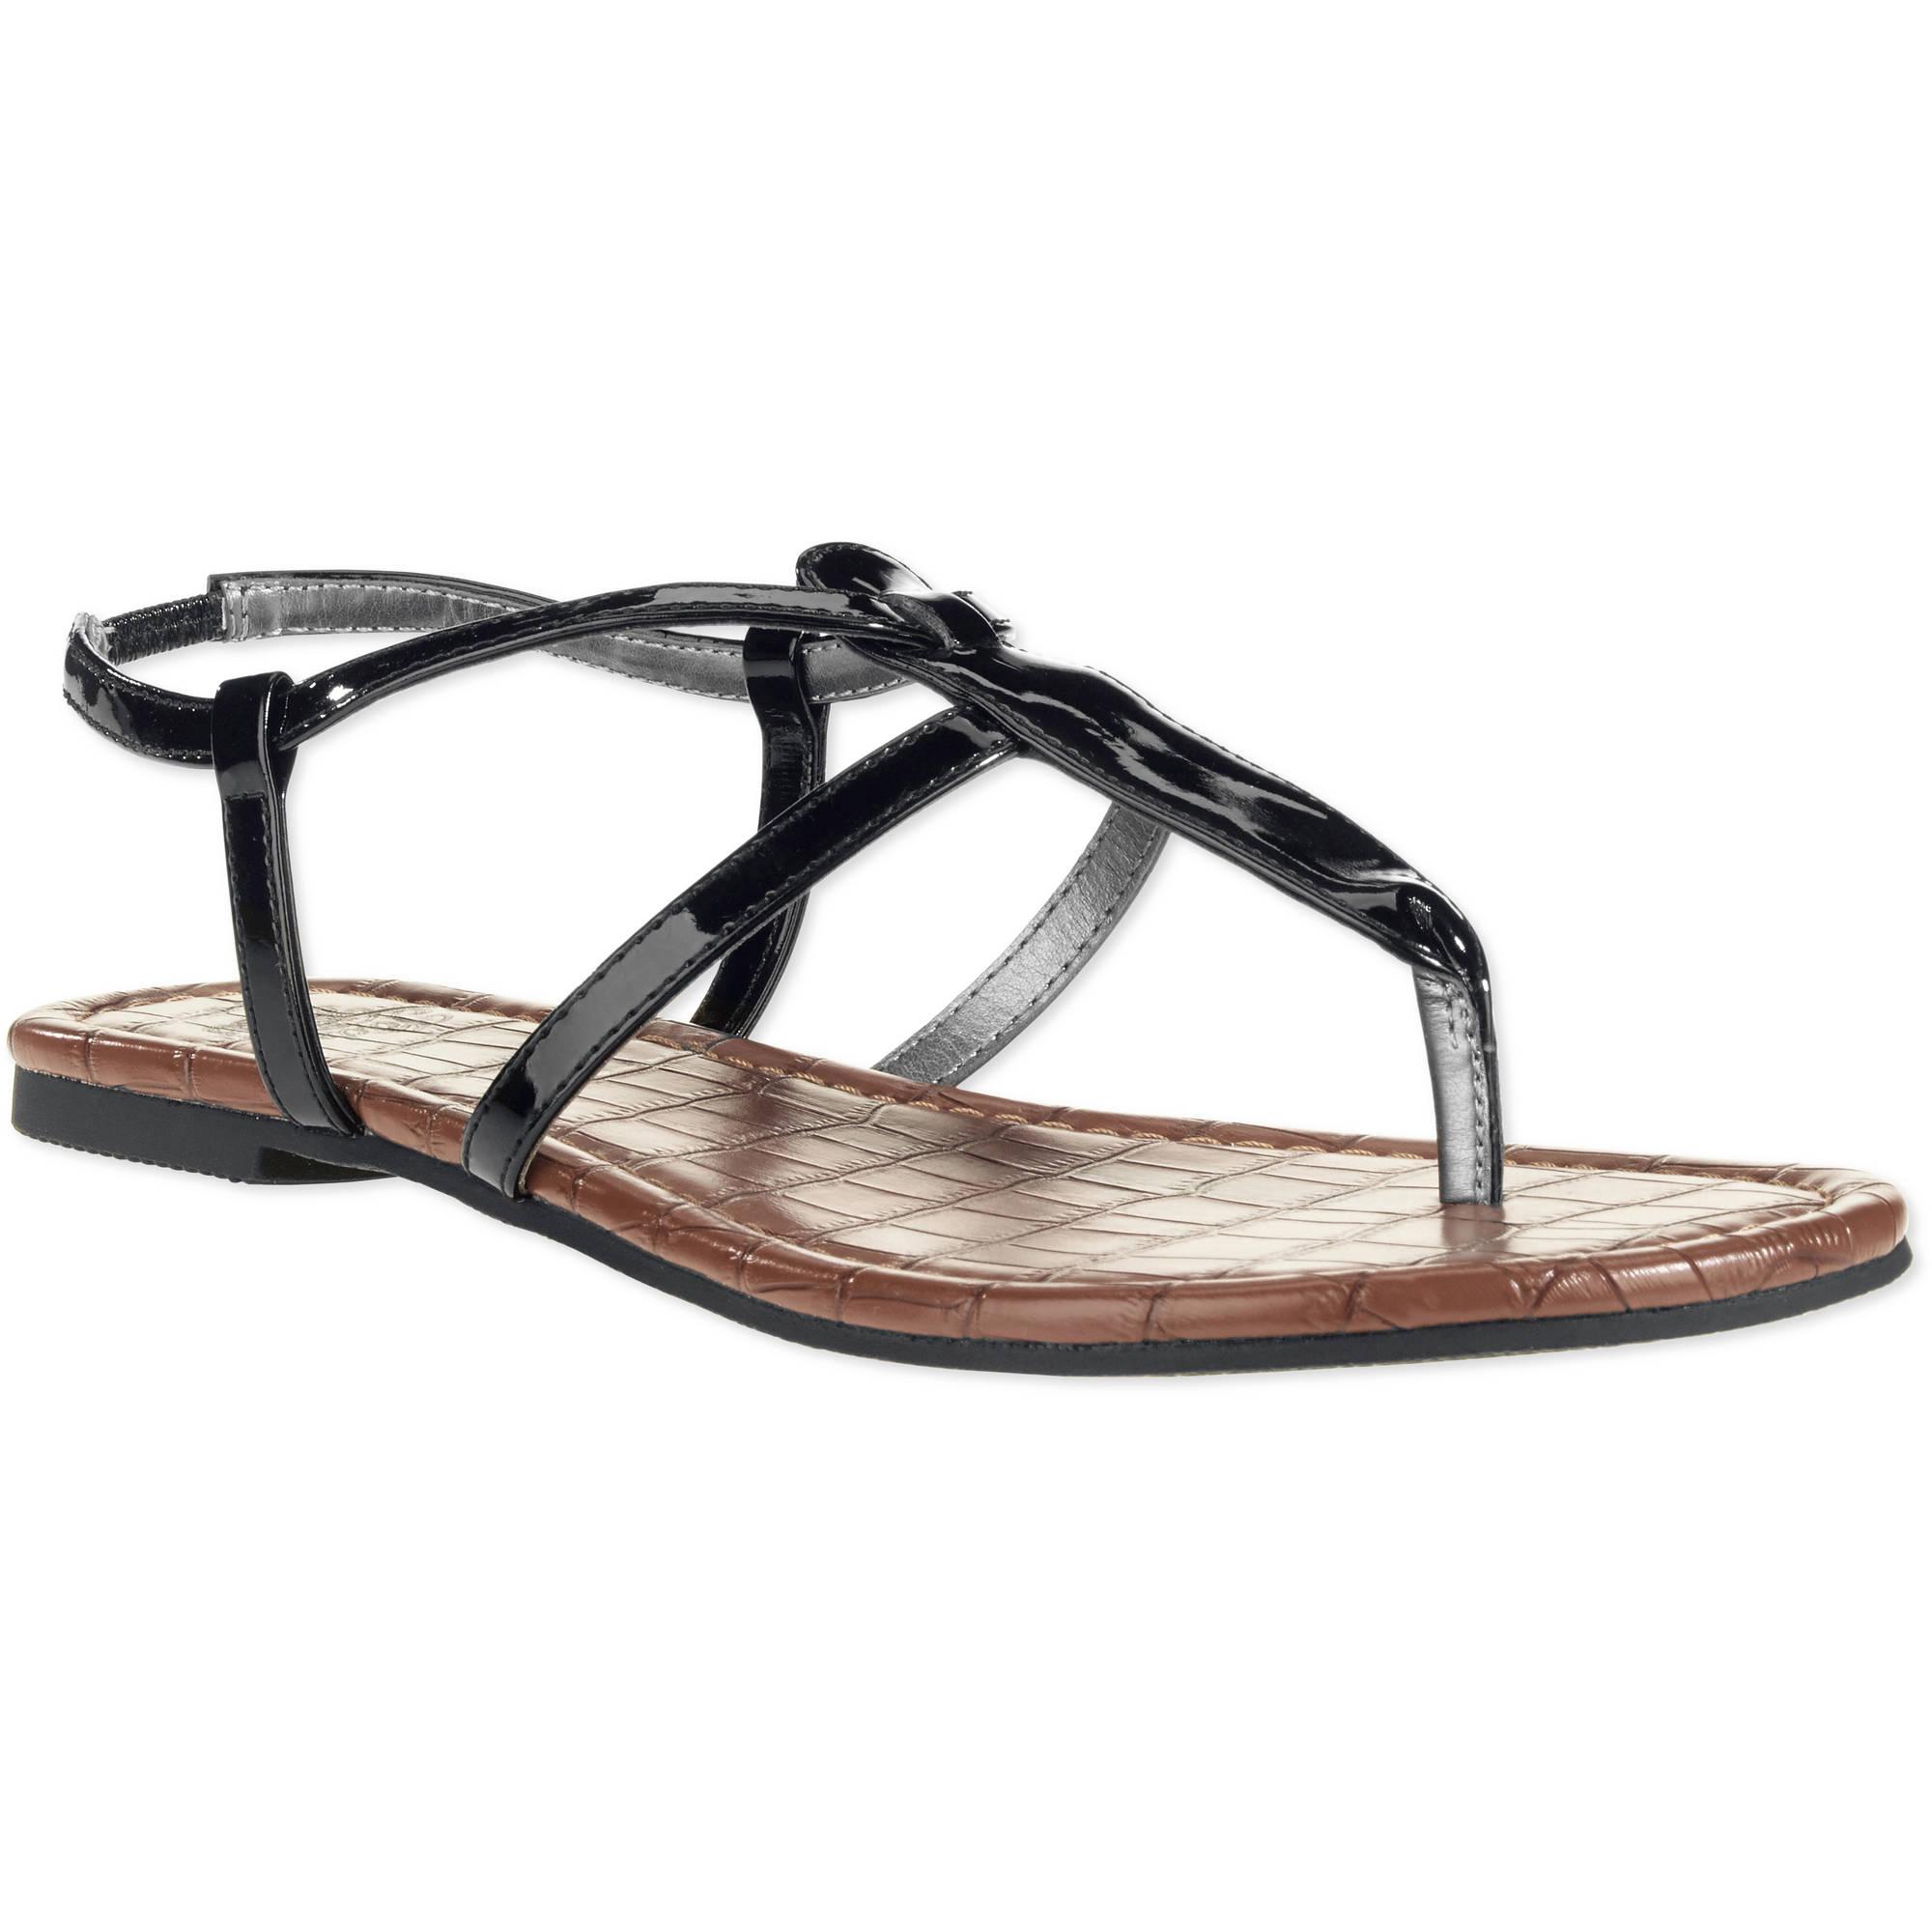 Womens sandals walmart - Jessica Simpson Elbella Women Open Toe Suede Sandals Walmart Com